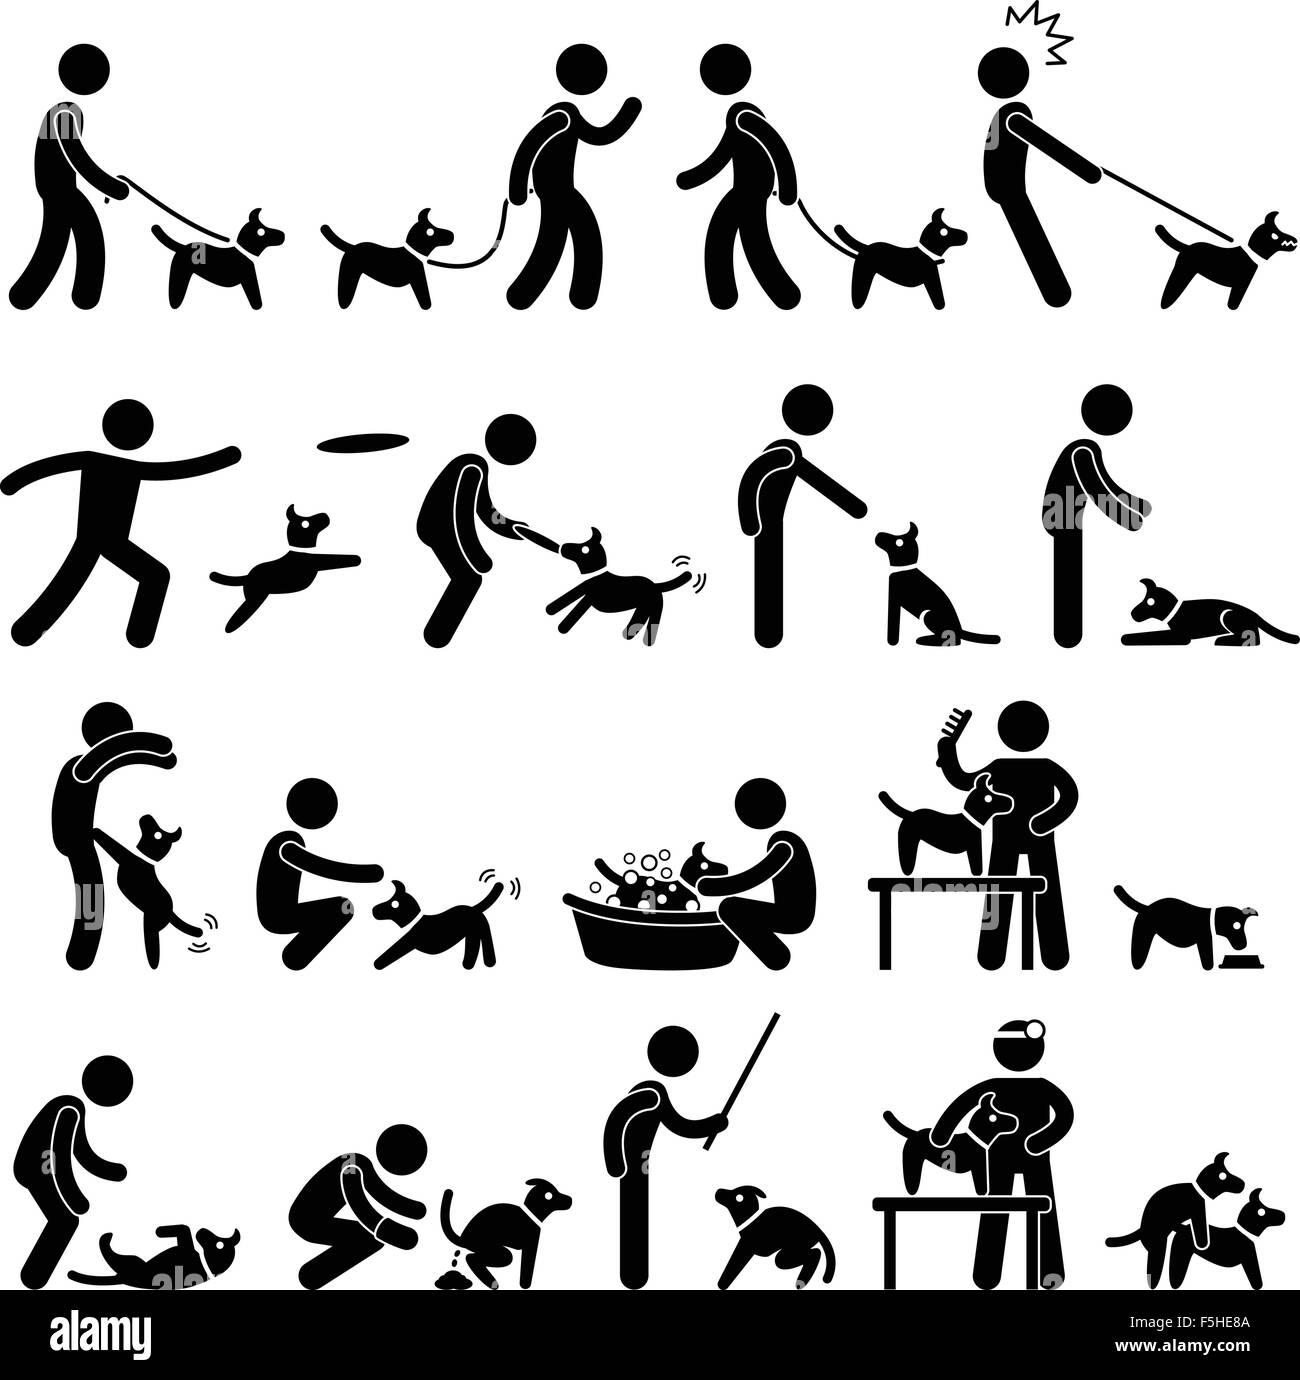 Dog Training Pictogram - Stock Vector